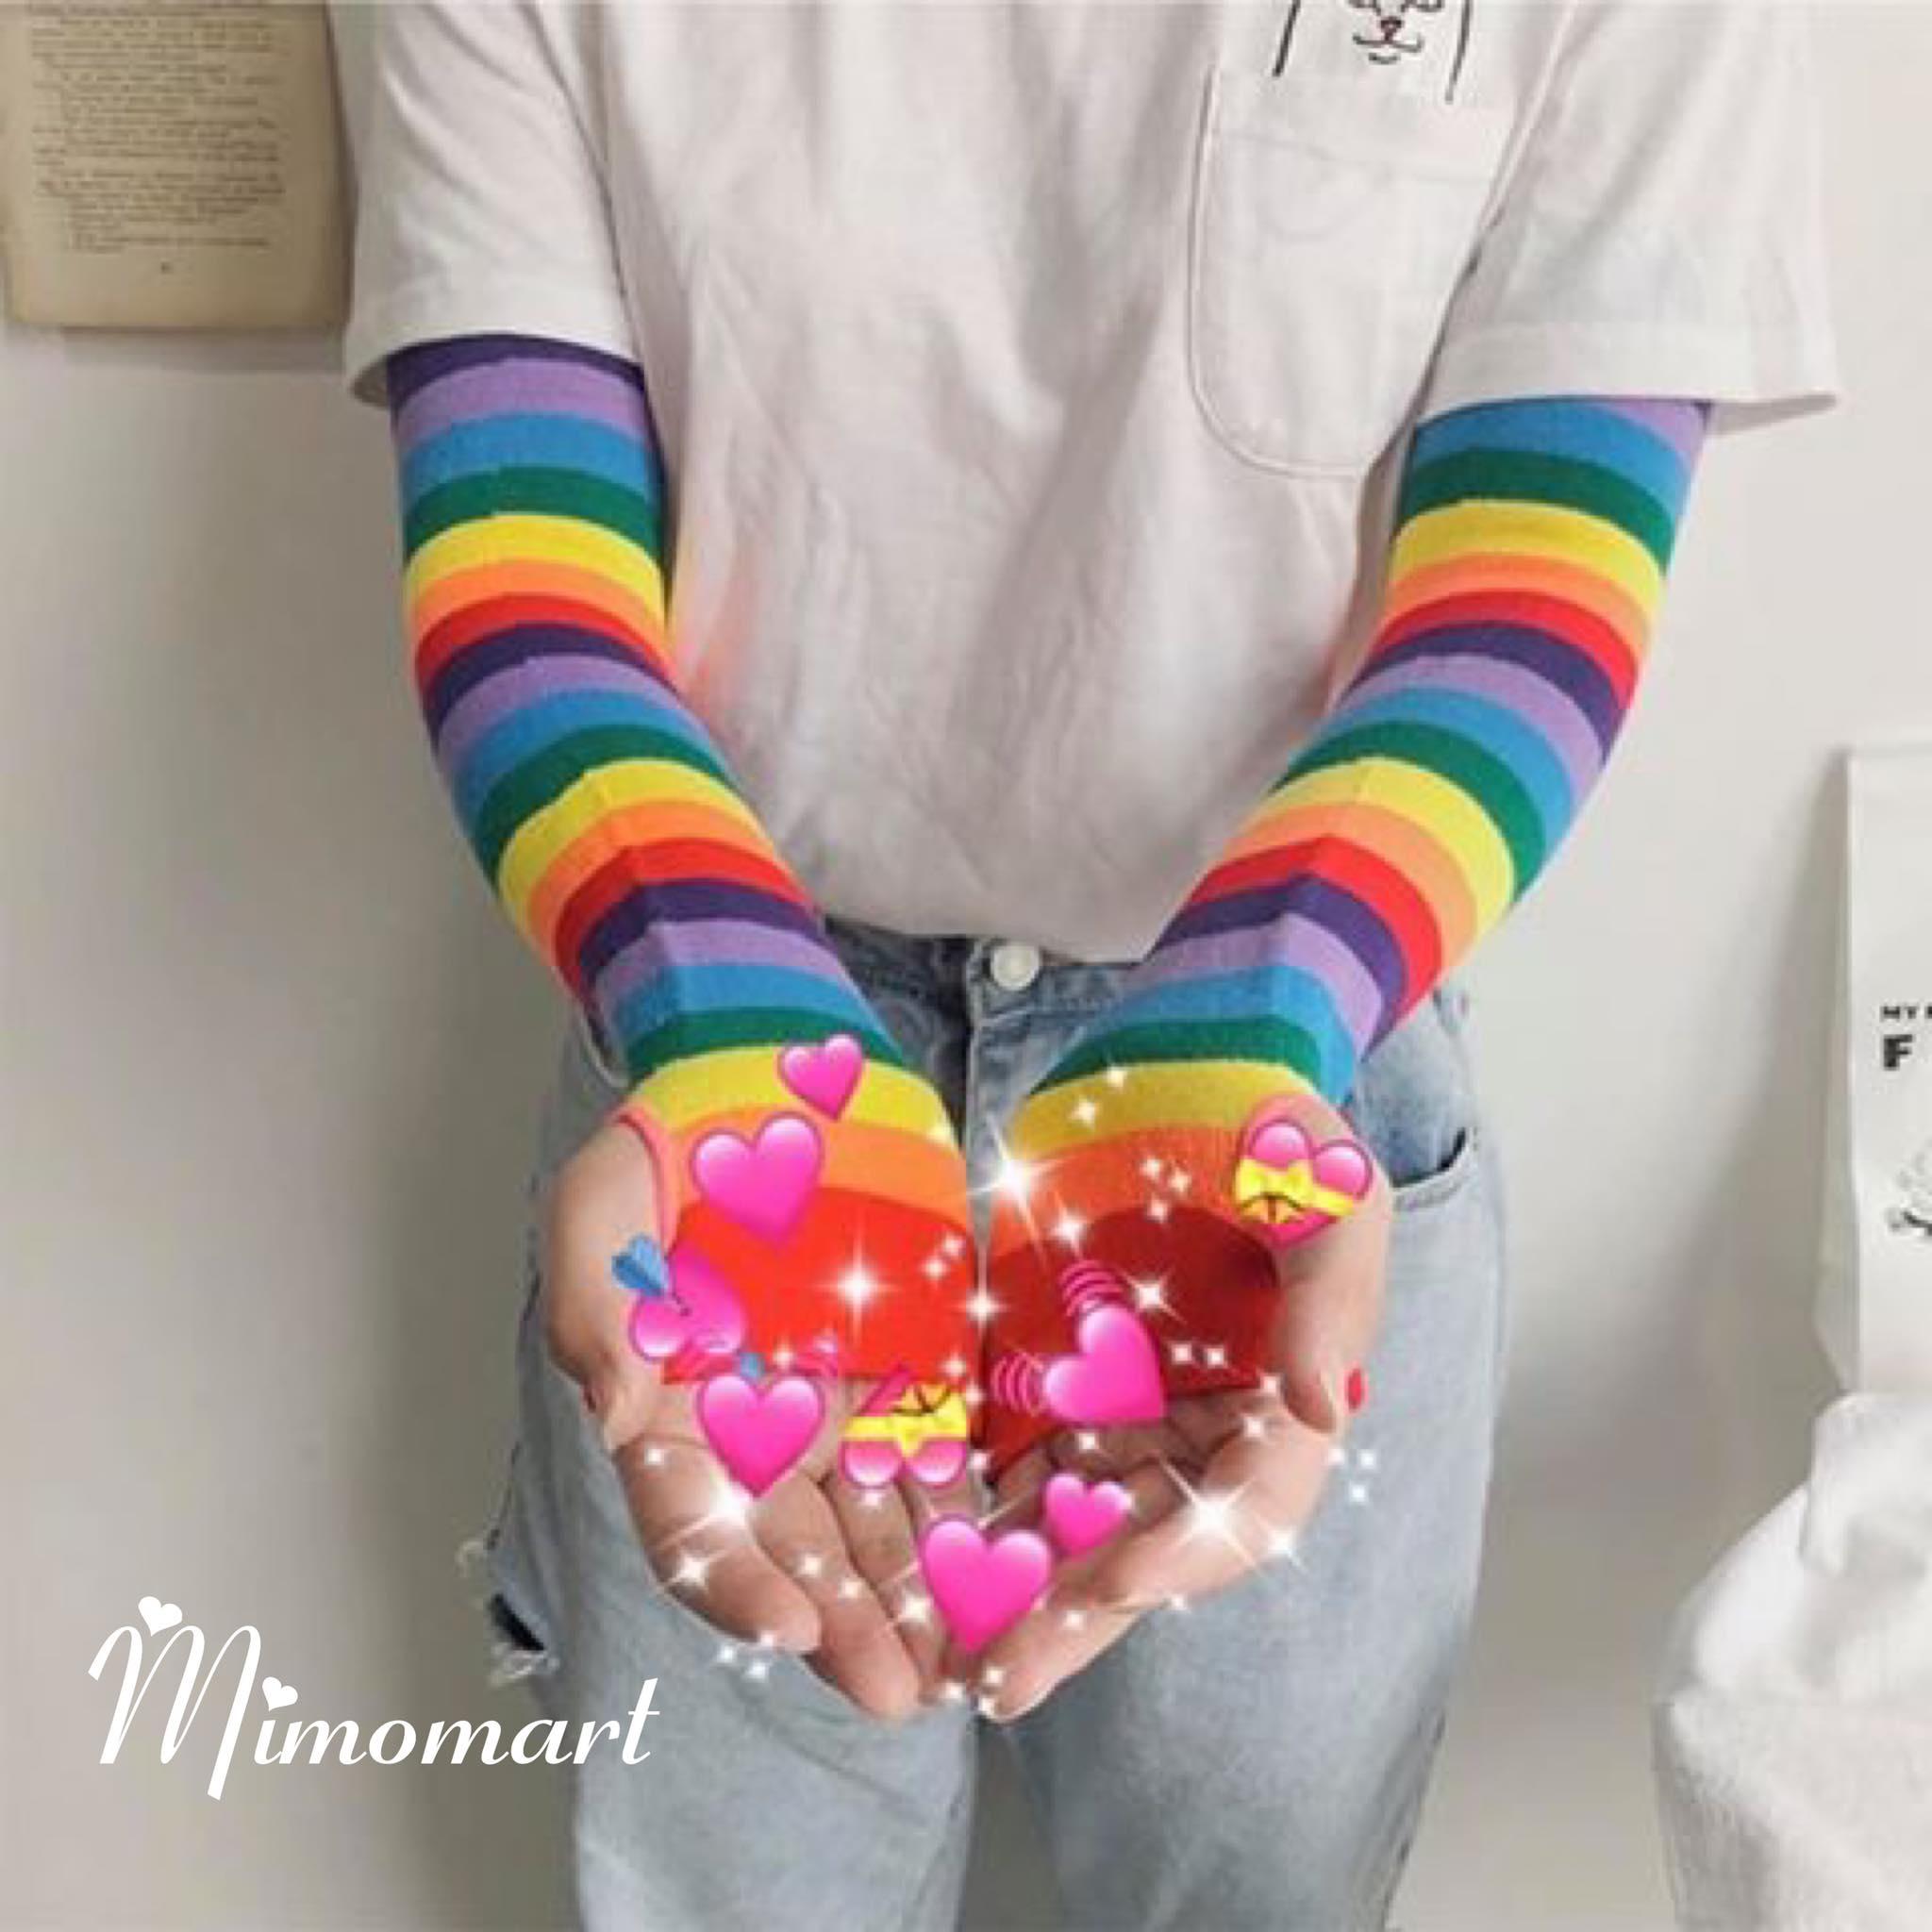 Găng tay dài rainbow